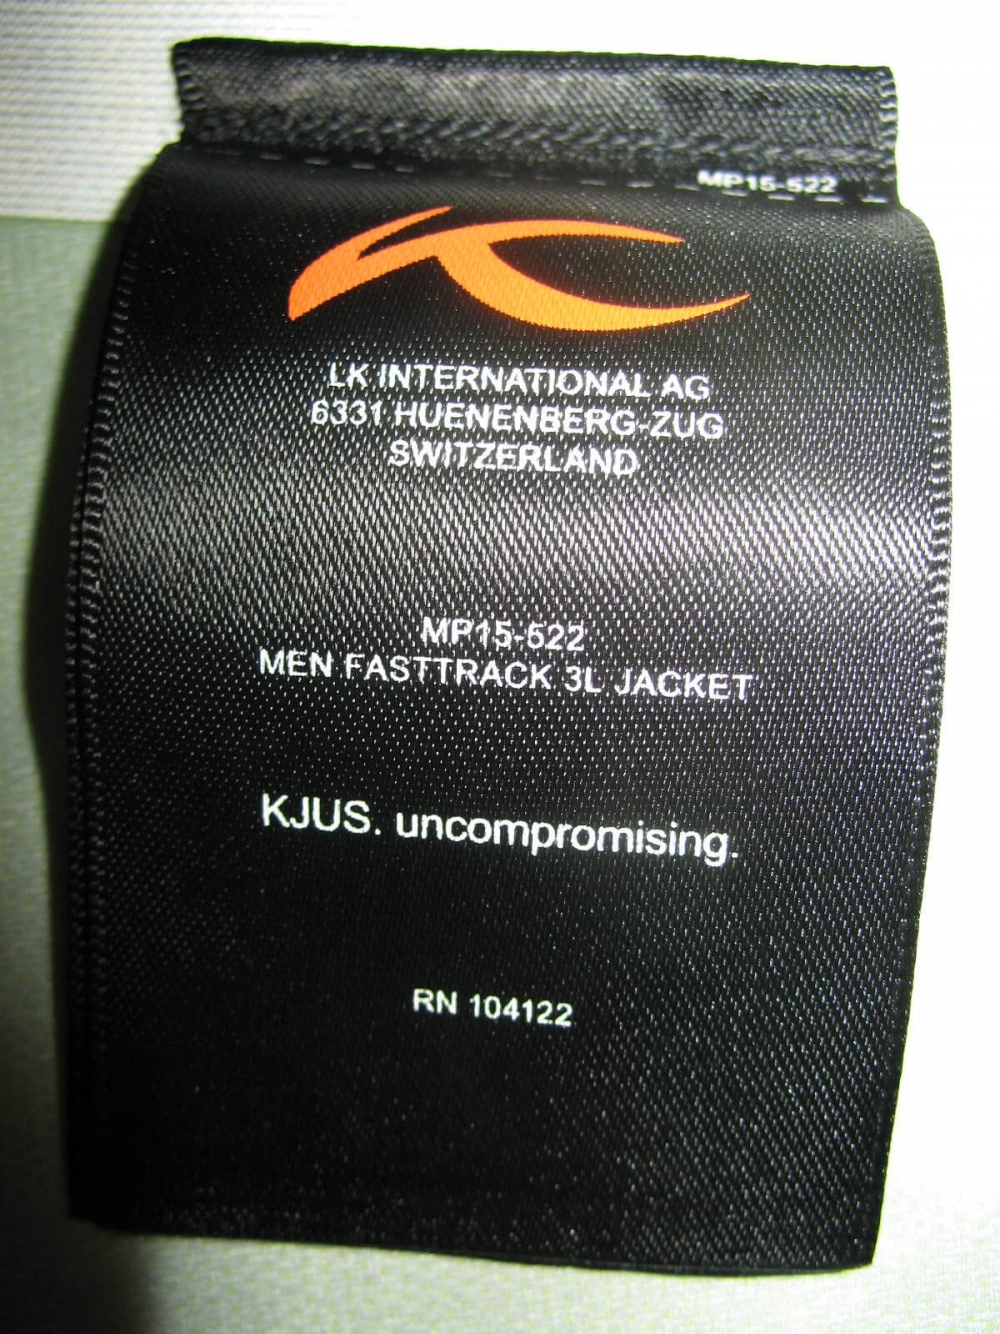 Куртка KJUS fasttrack 3L jacket (размер 56/XXL) - 8